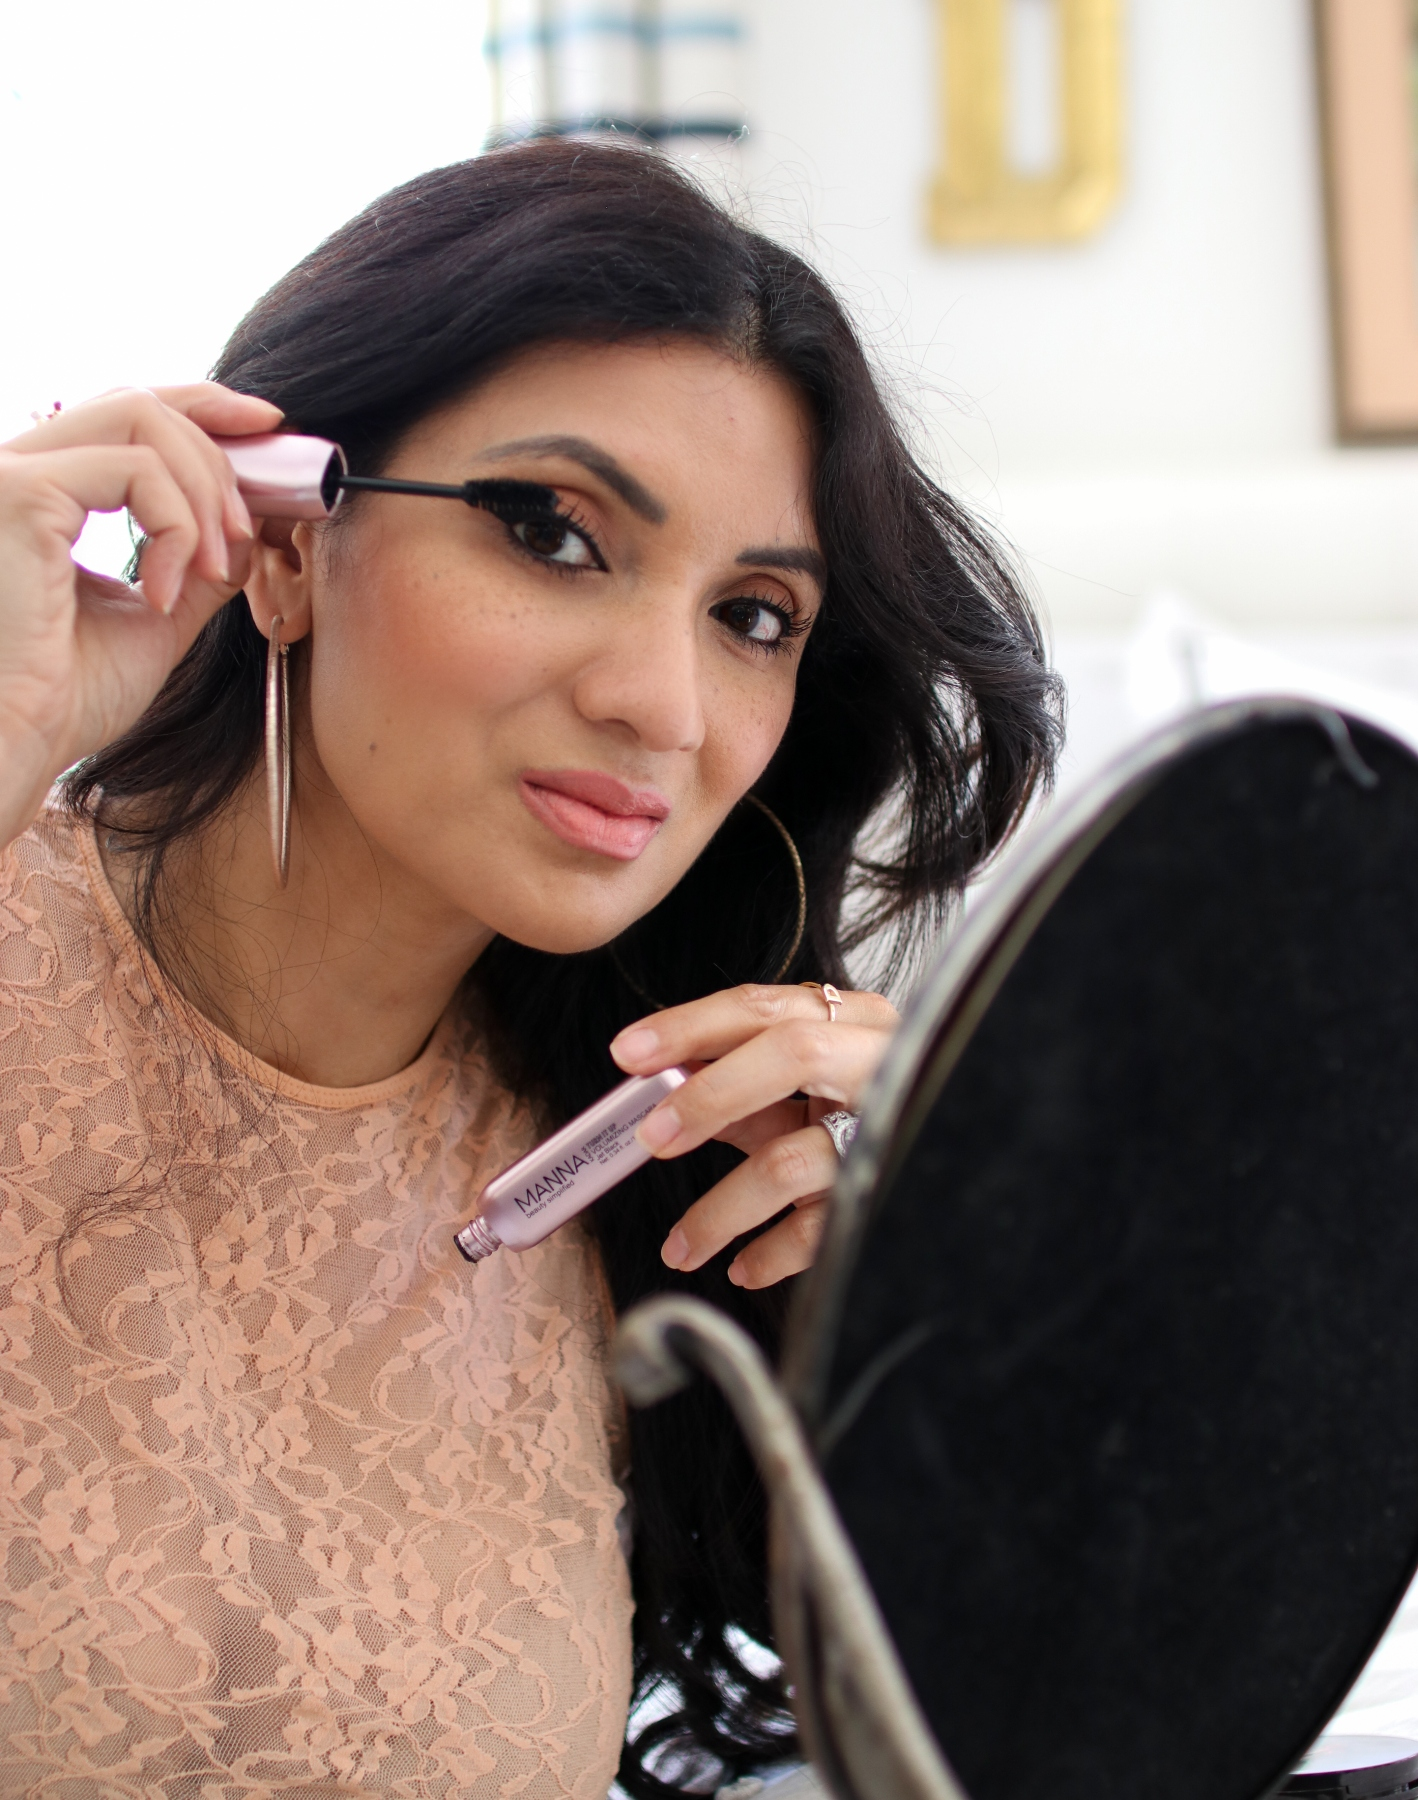 Manna Kadar Cosmetics - Turn It Up Volumizing Mascara - Debbie Savage